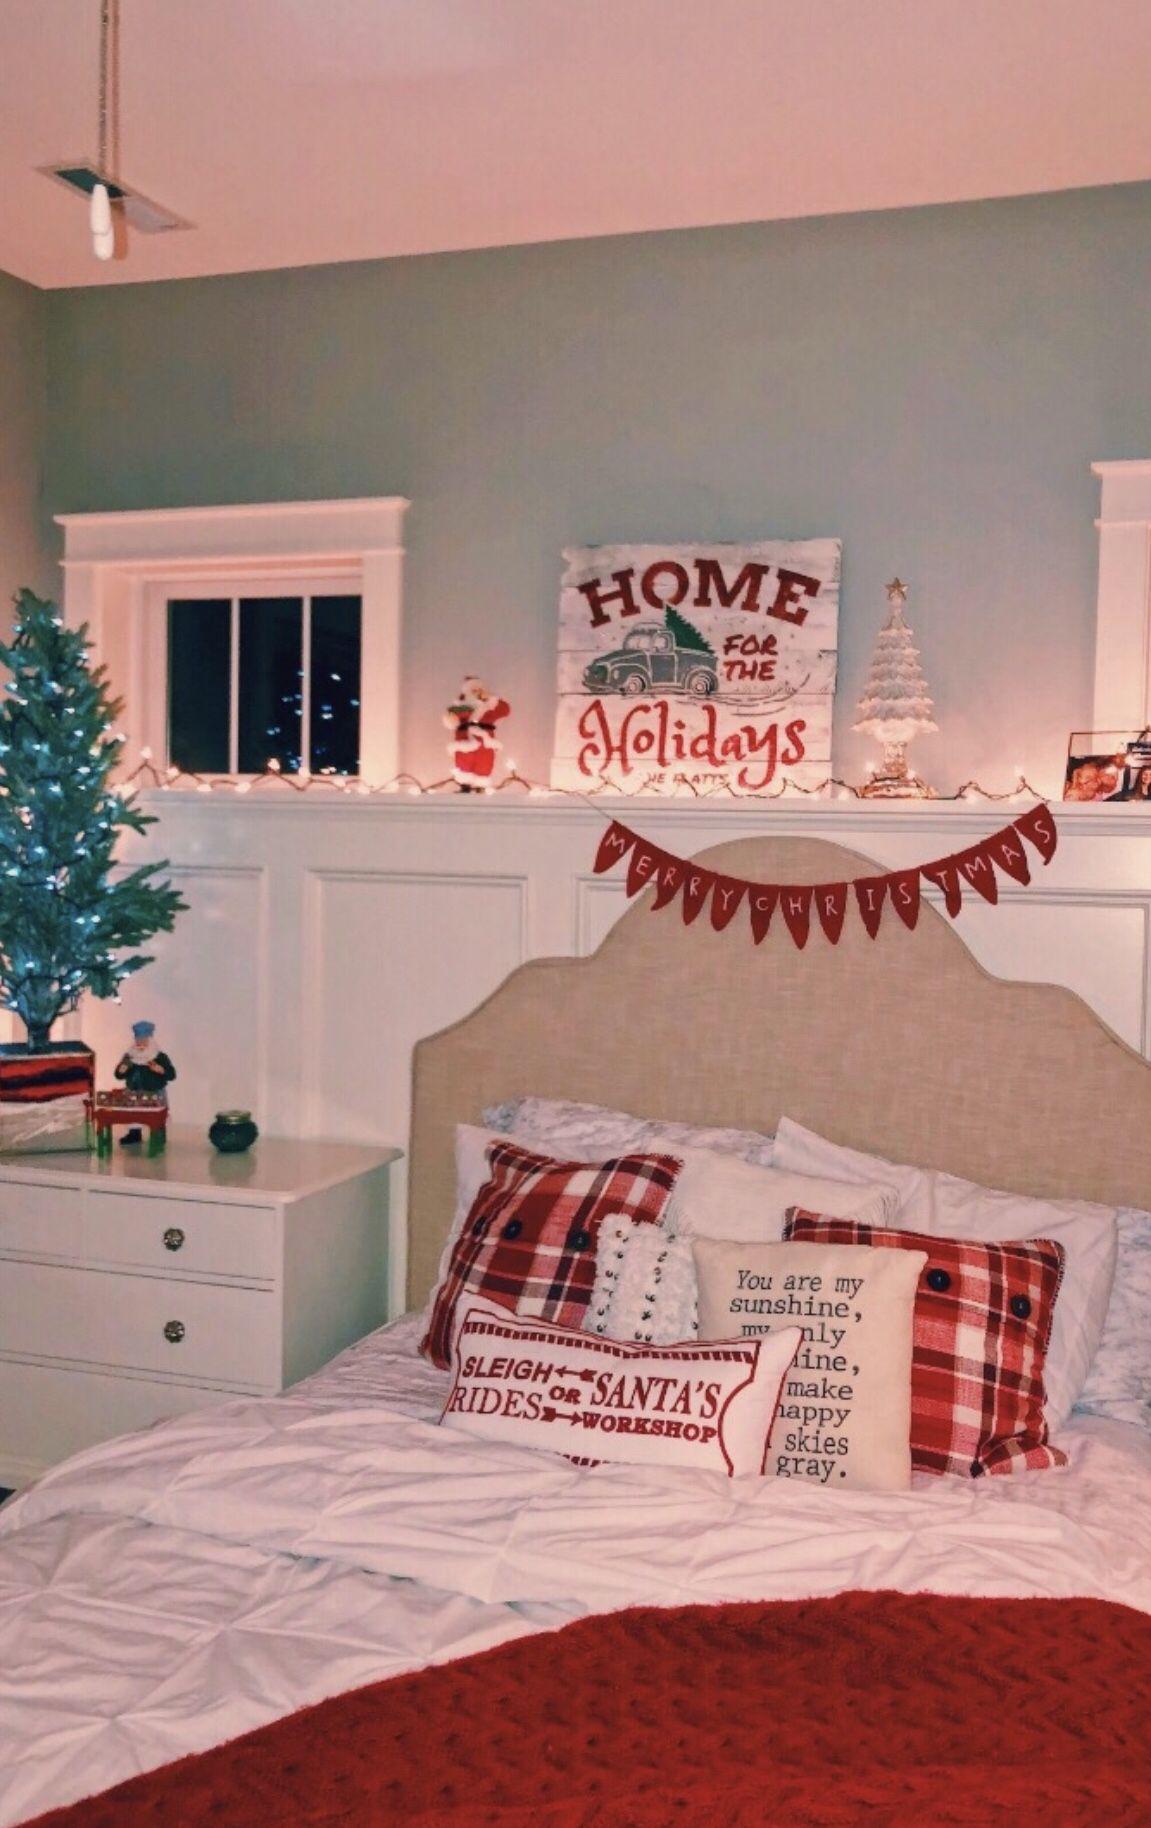 Christmas Room Image By Lizzie On Christmas Christmas